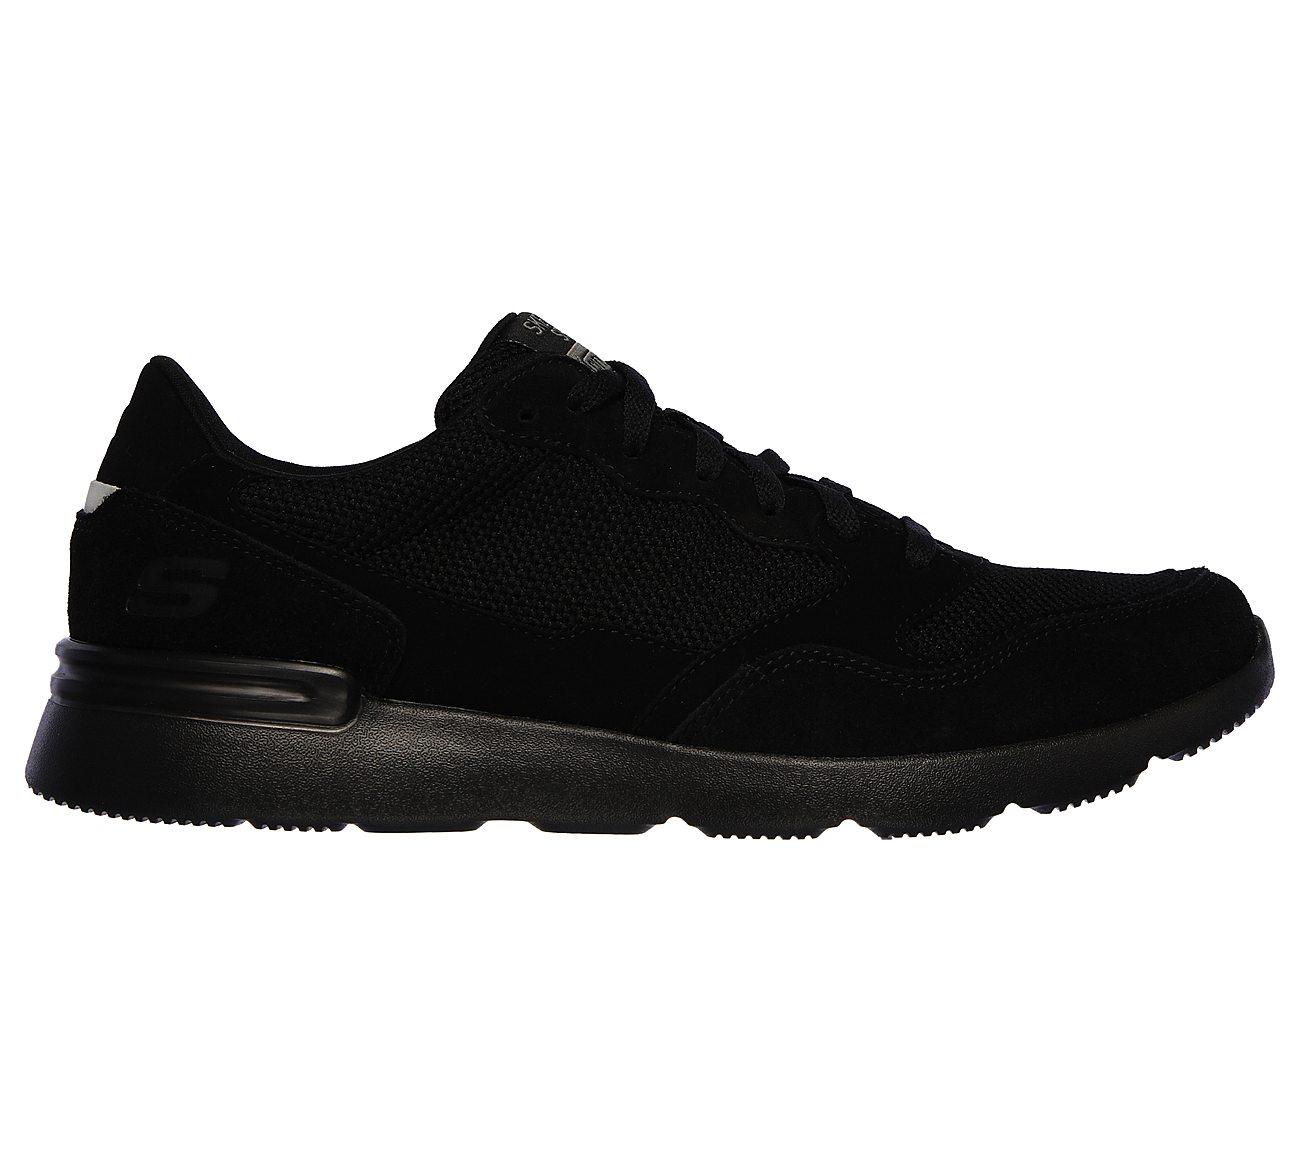 Shop for Men Skechers Relaxed Fit: Crossbar Black (51885 BKW